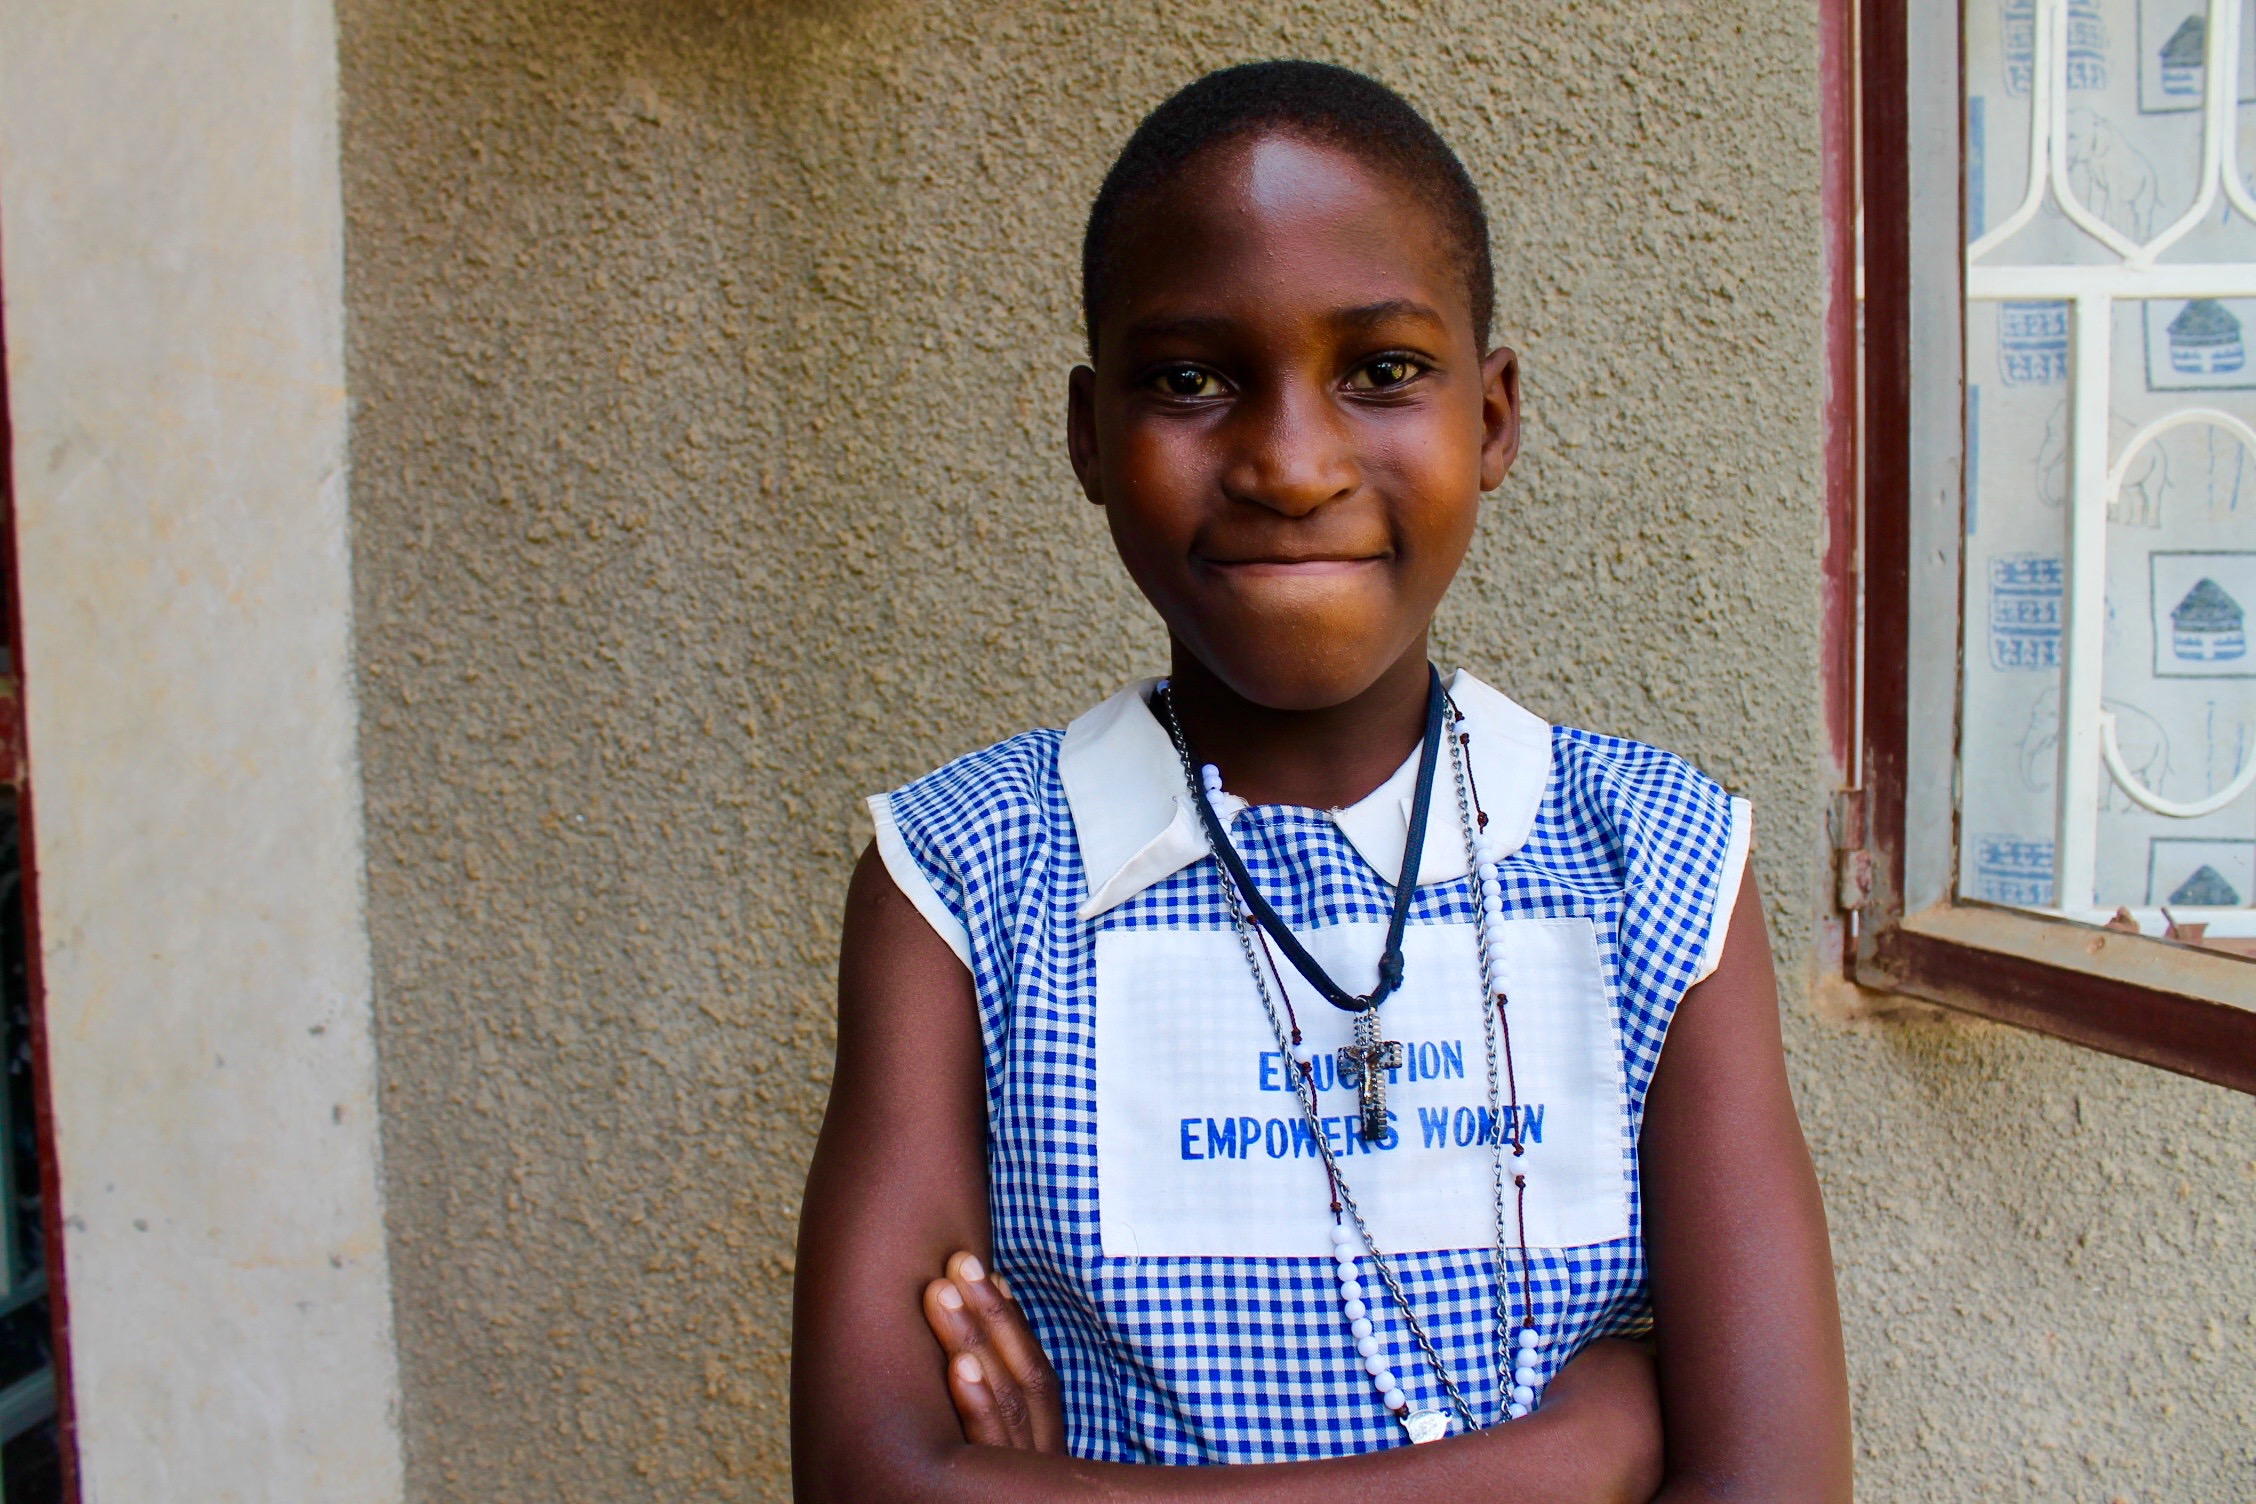 Education Empowers Women_Dorm Opening.jpg